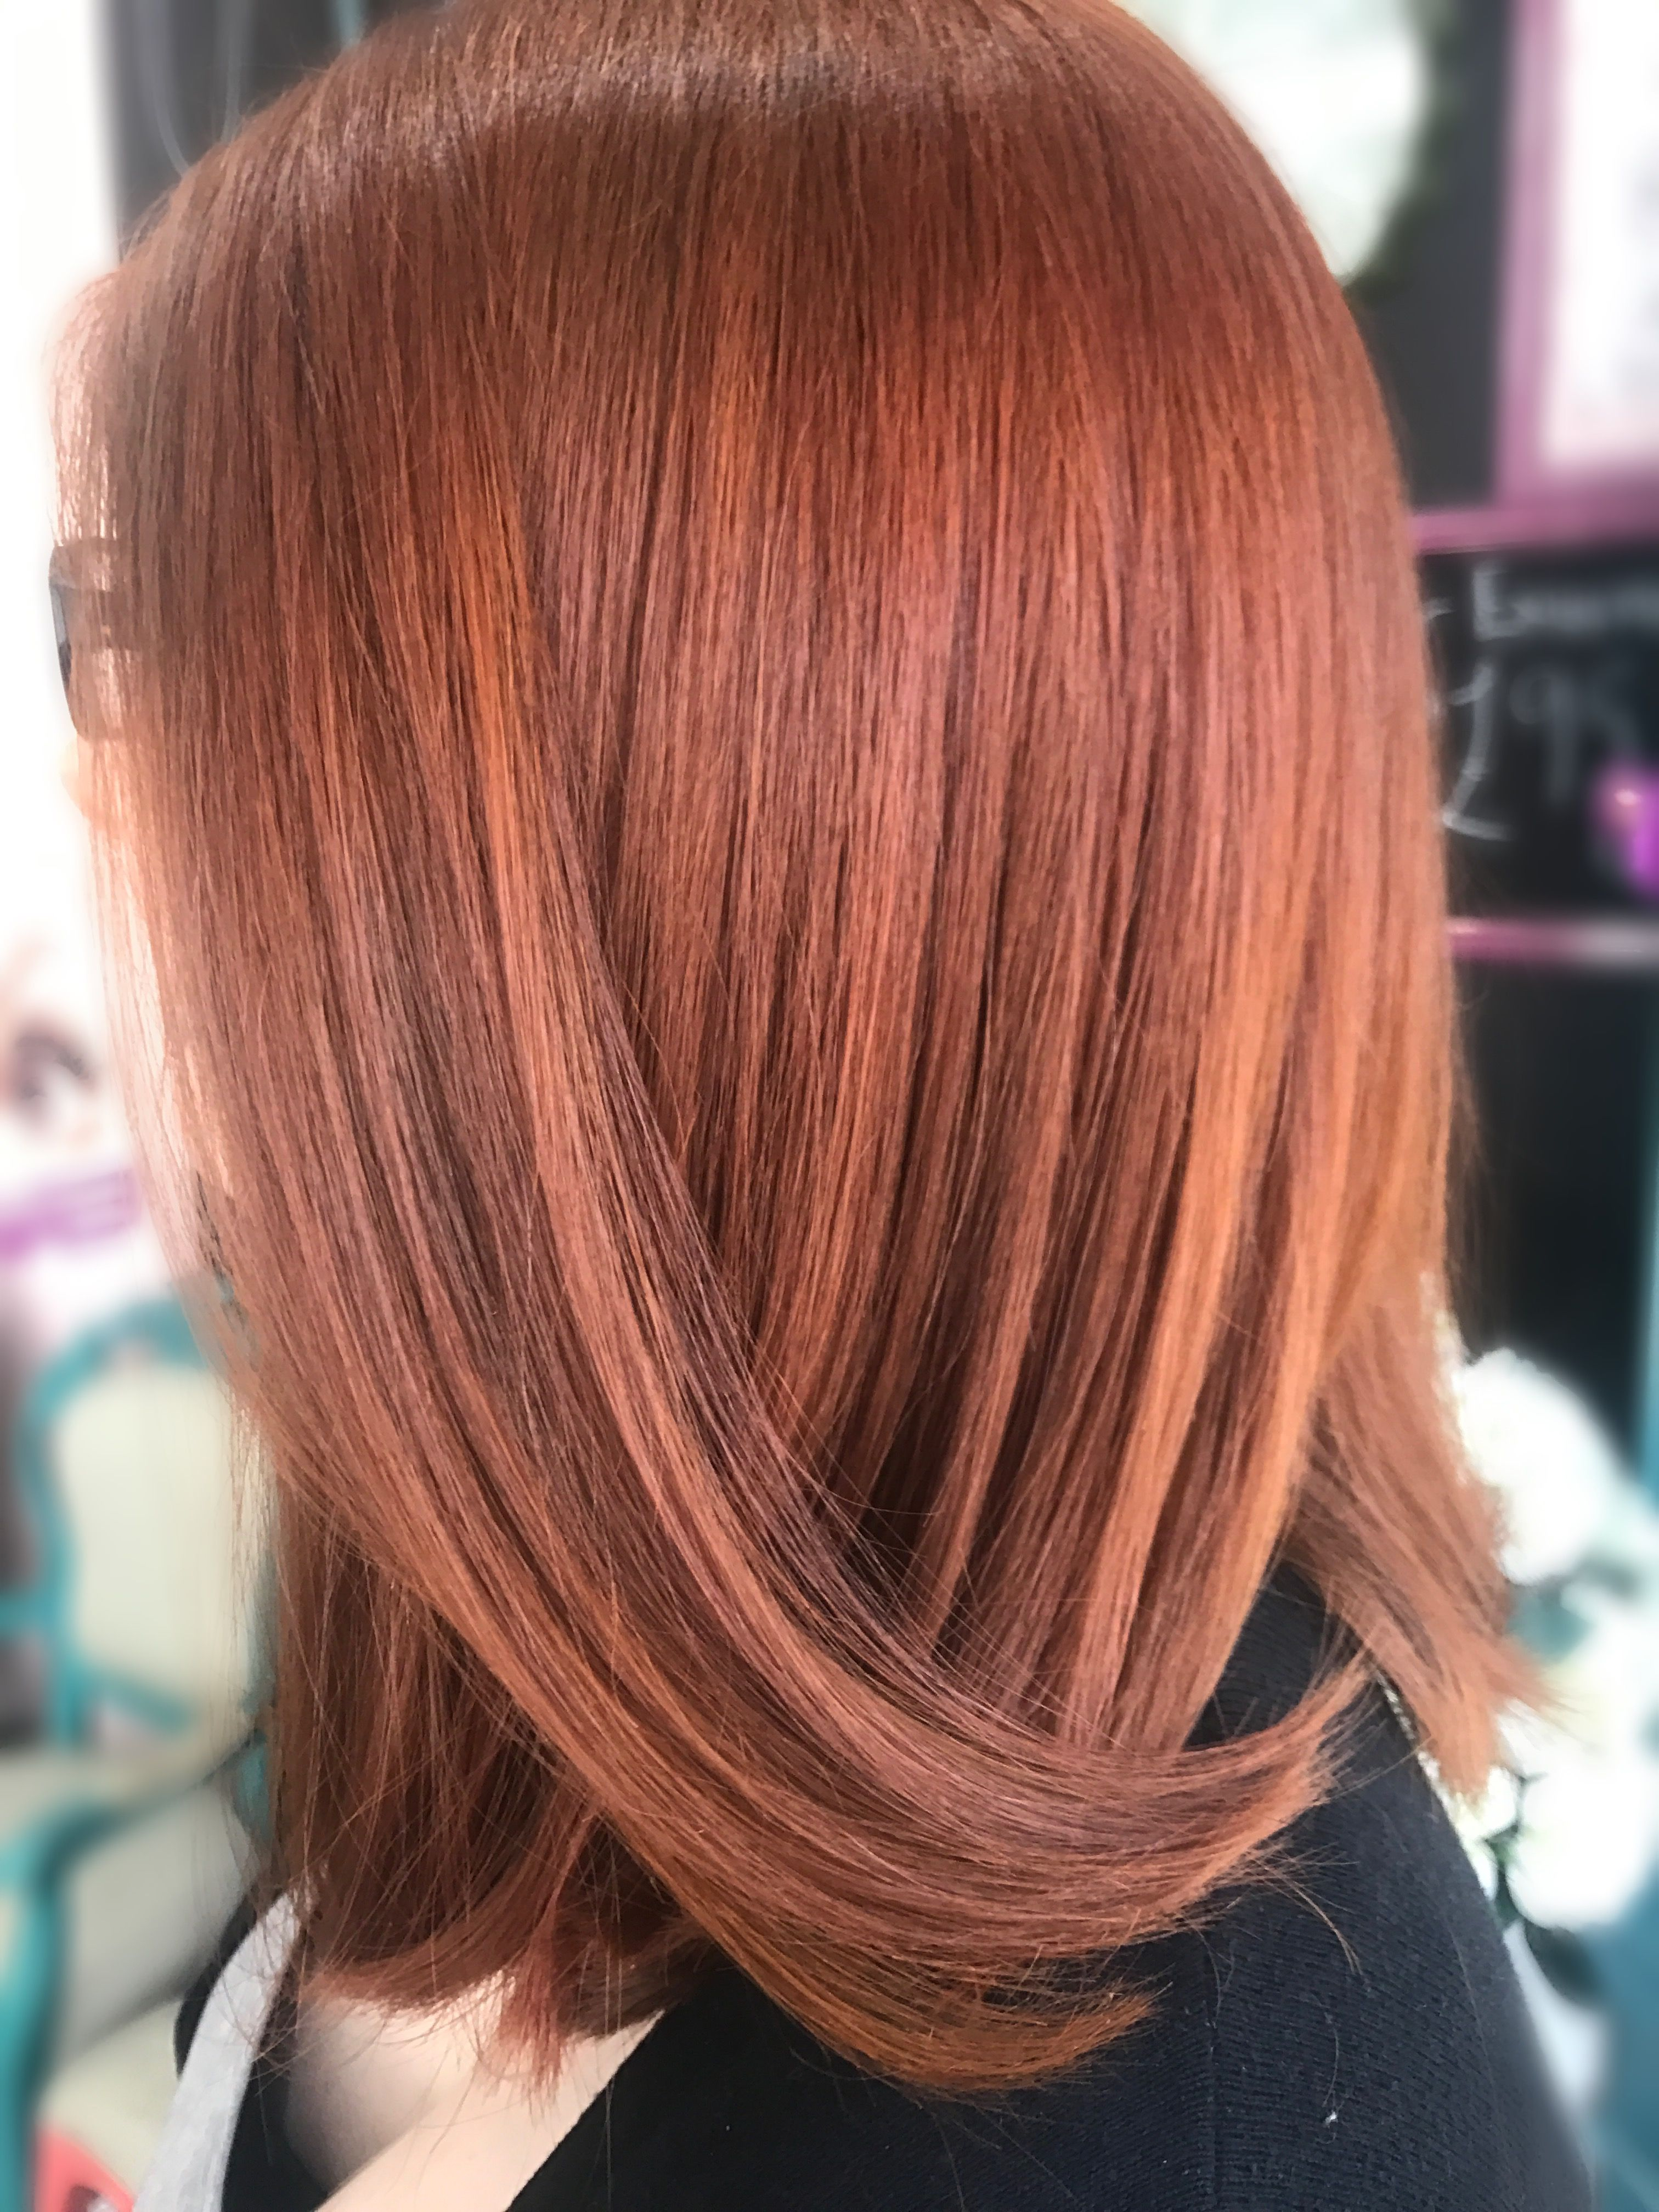 Copper hair using Schwarzkopf Igora Royal 7-77 | Hair in ...